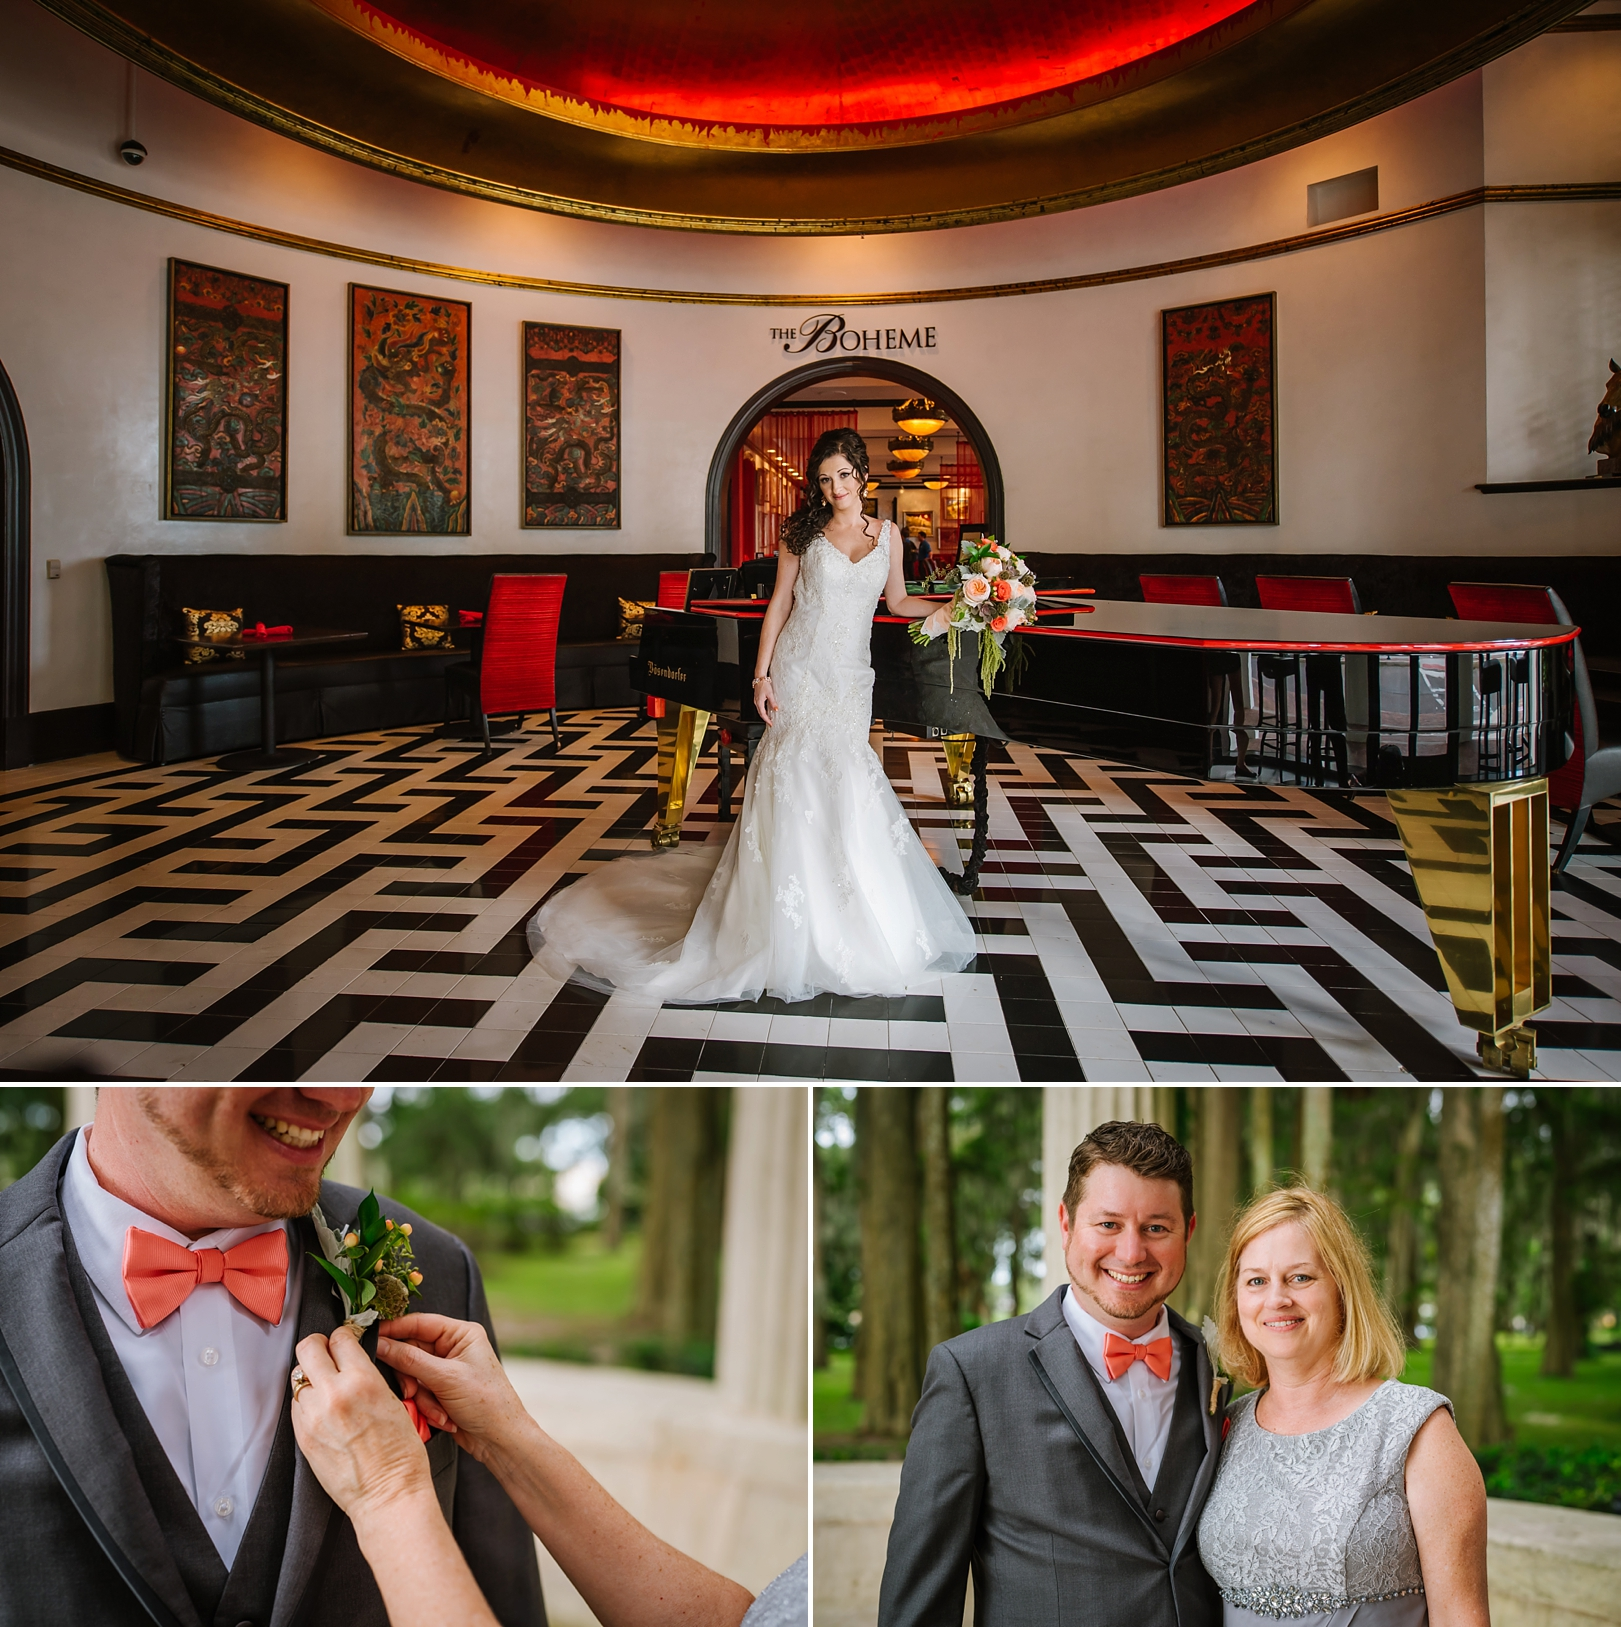 kraft-azalea-gardens-stylish-elopment-wedding-photography_0009.jpg